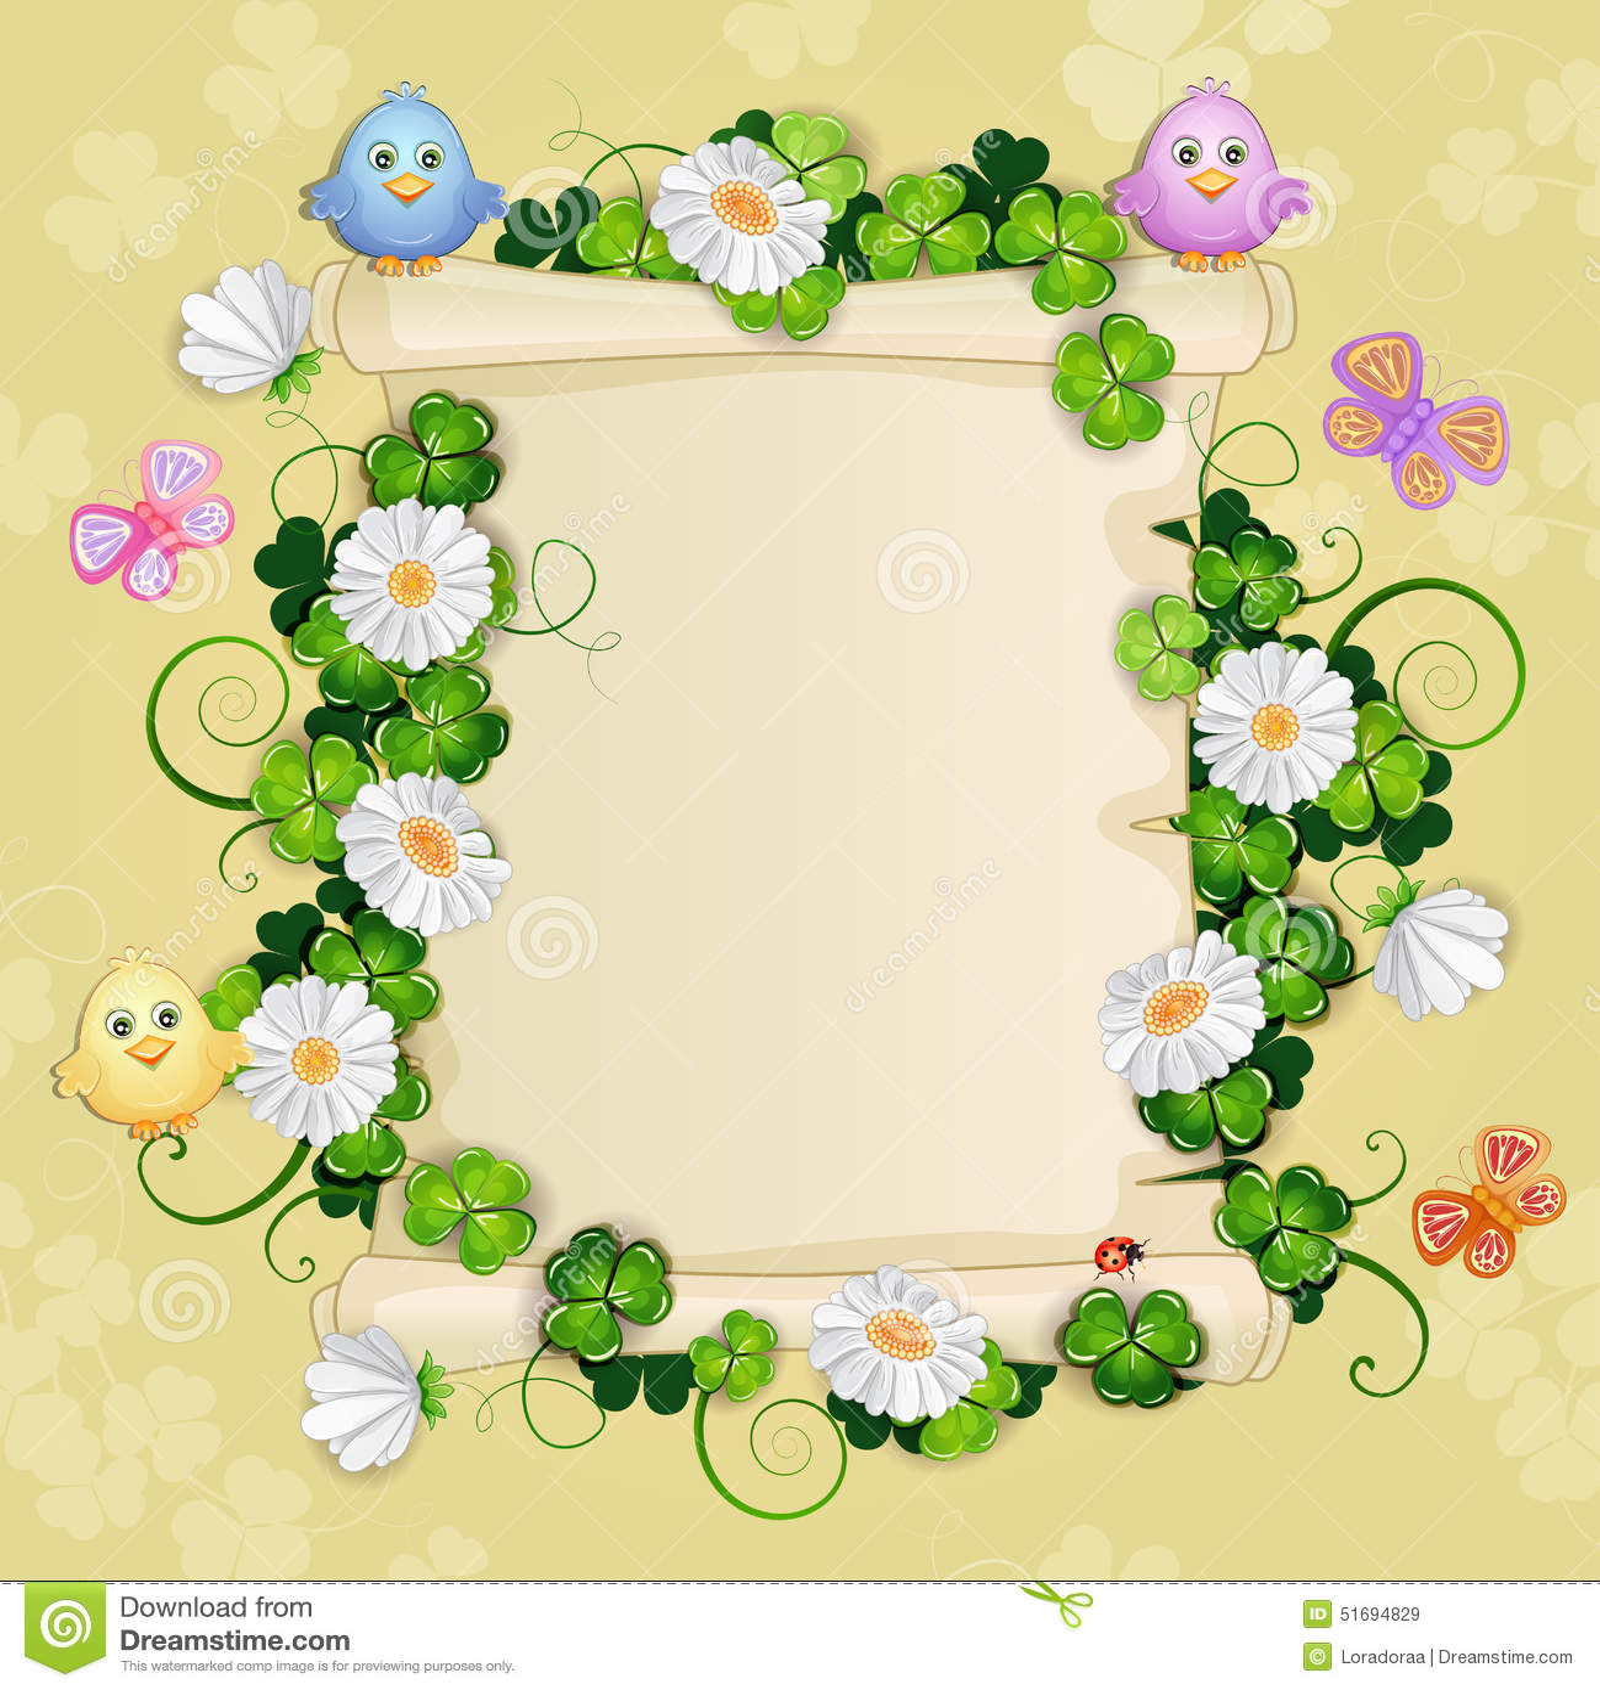 Illustration with beautiful flowers stock illustration download illustration with beautiful flowers stock illustration illustration of flower cute 51694829 izmirmasajfo